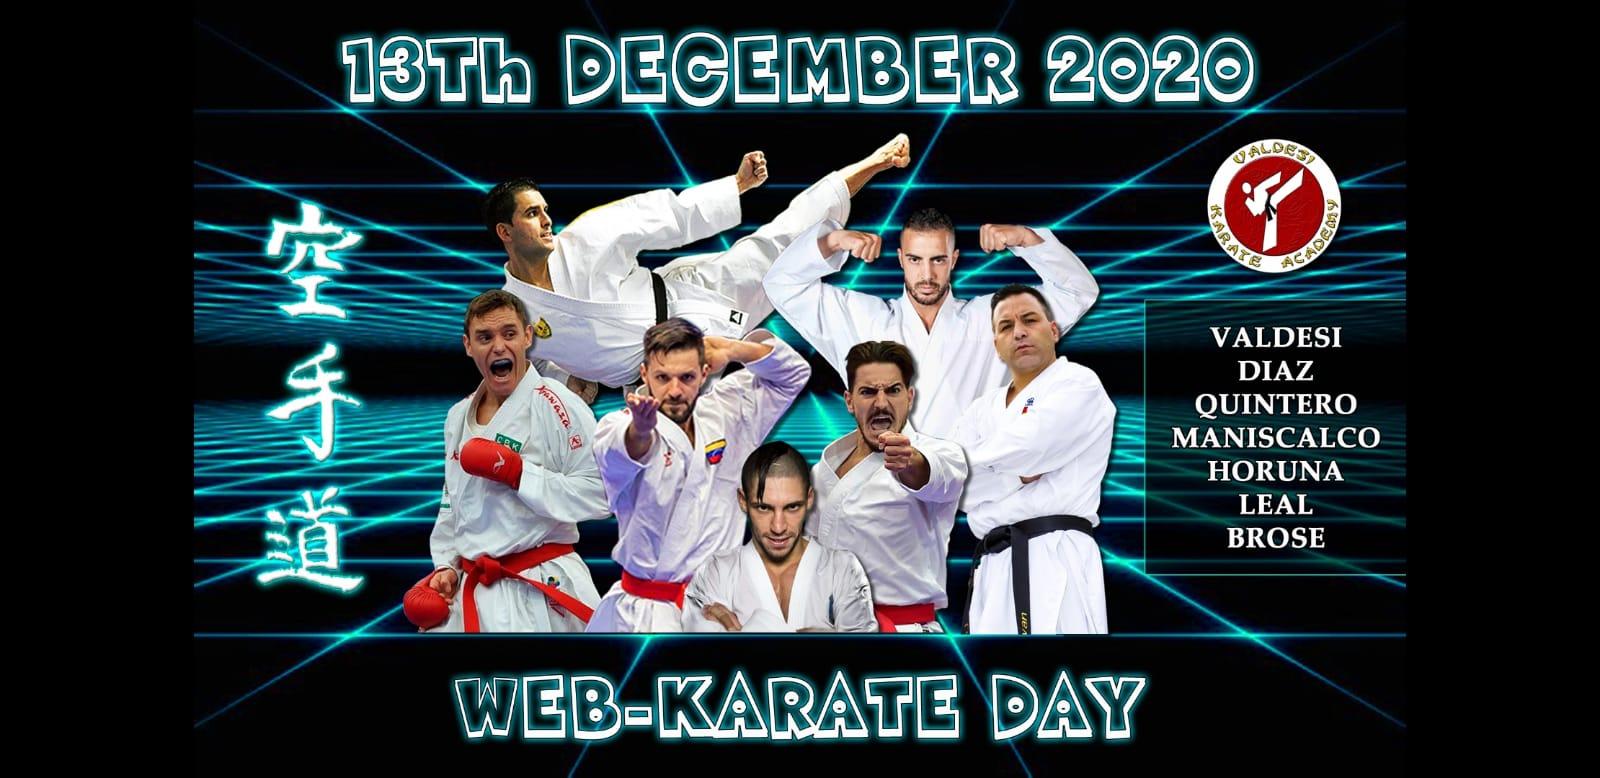 Web Karate Day - Session Kumite - Maniscalco